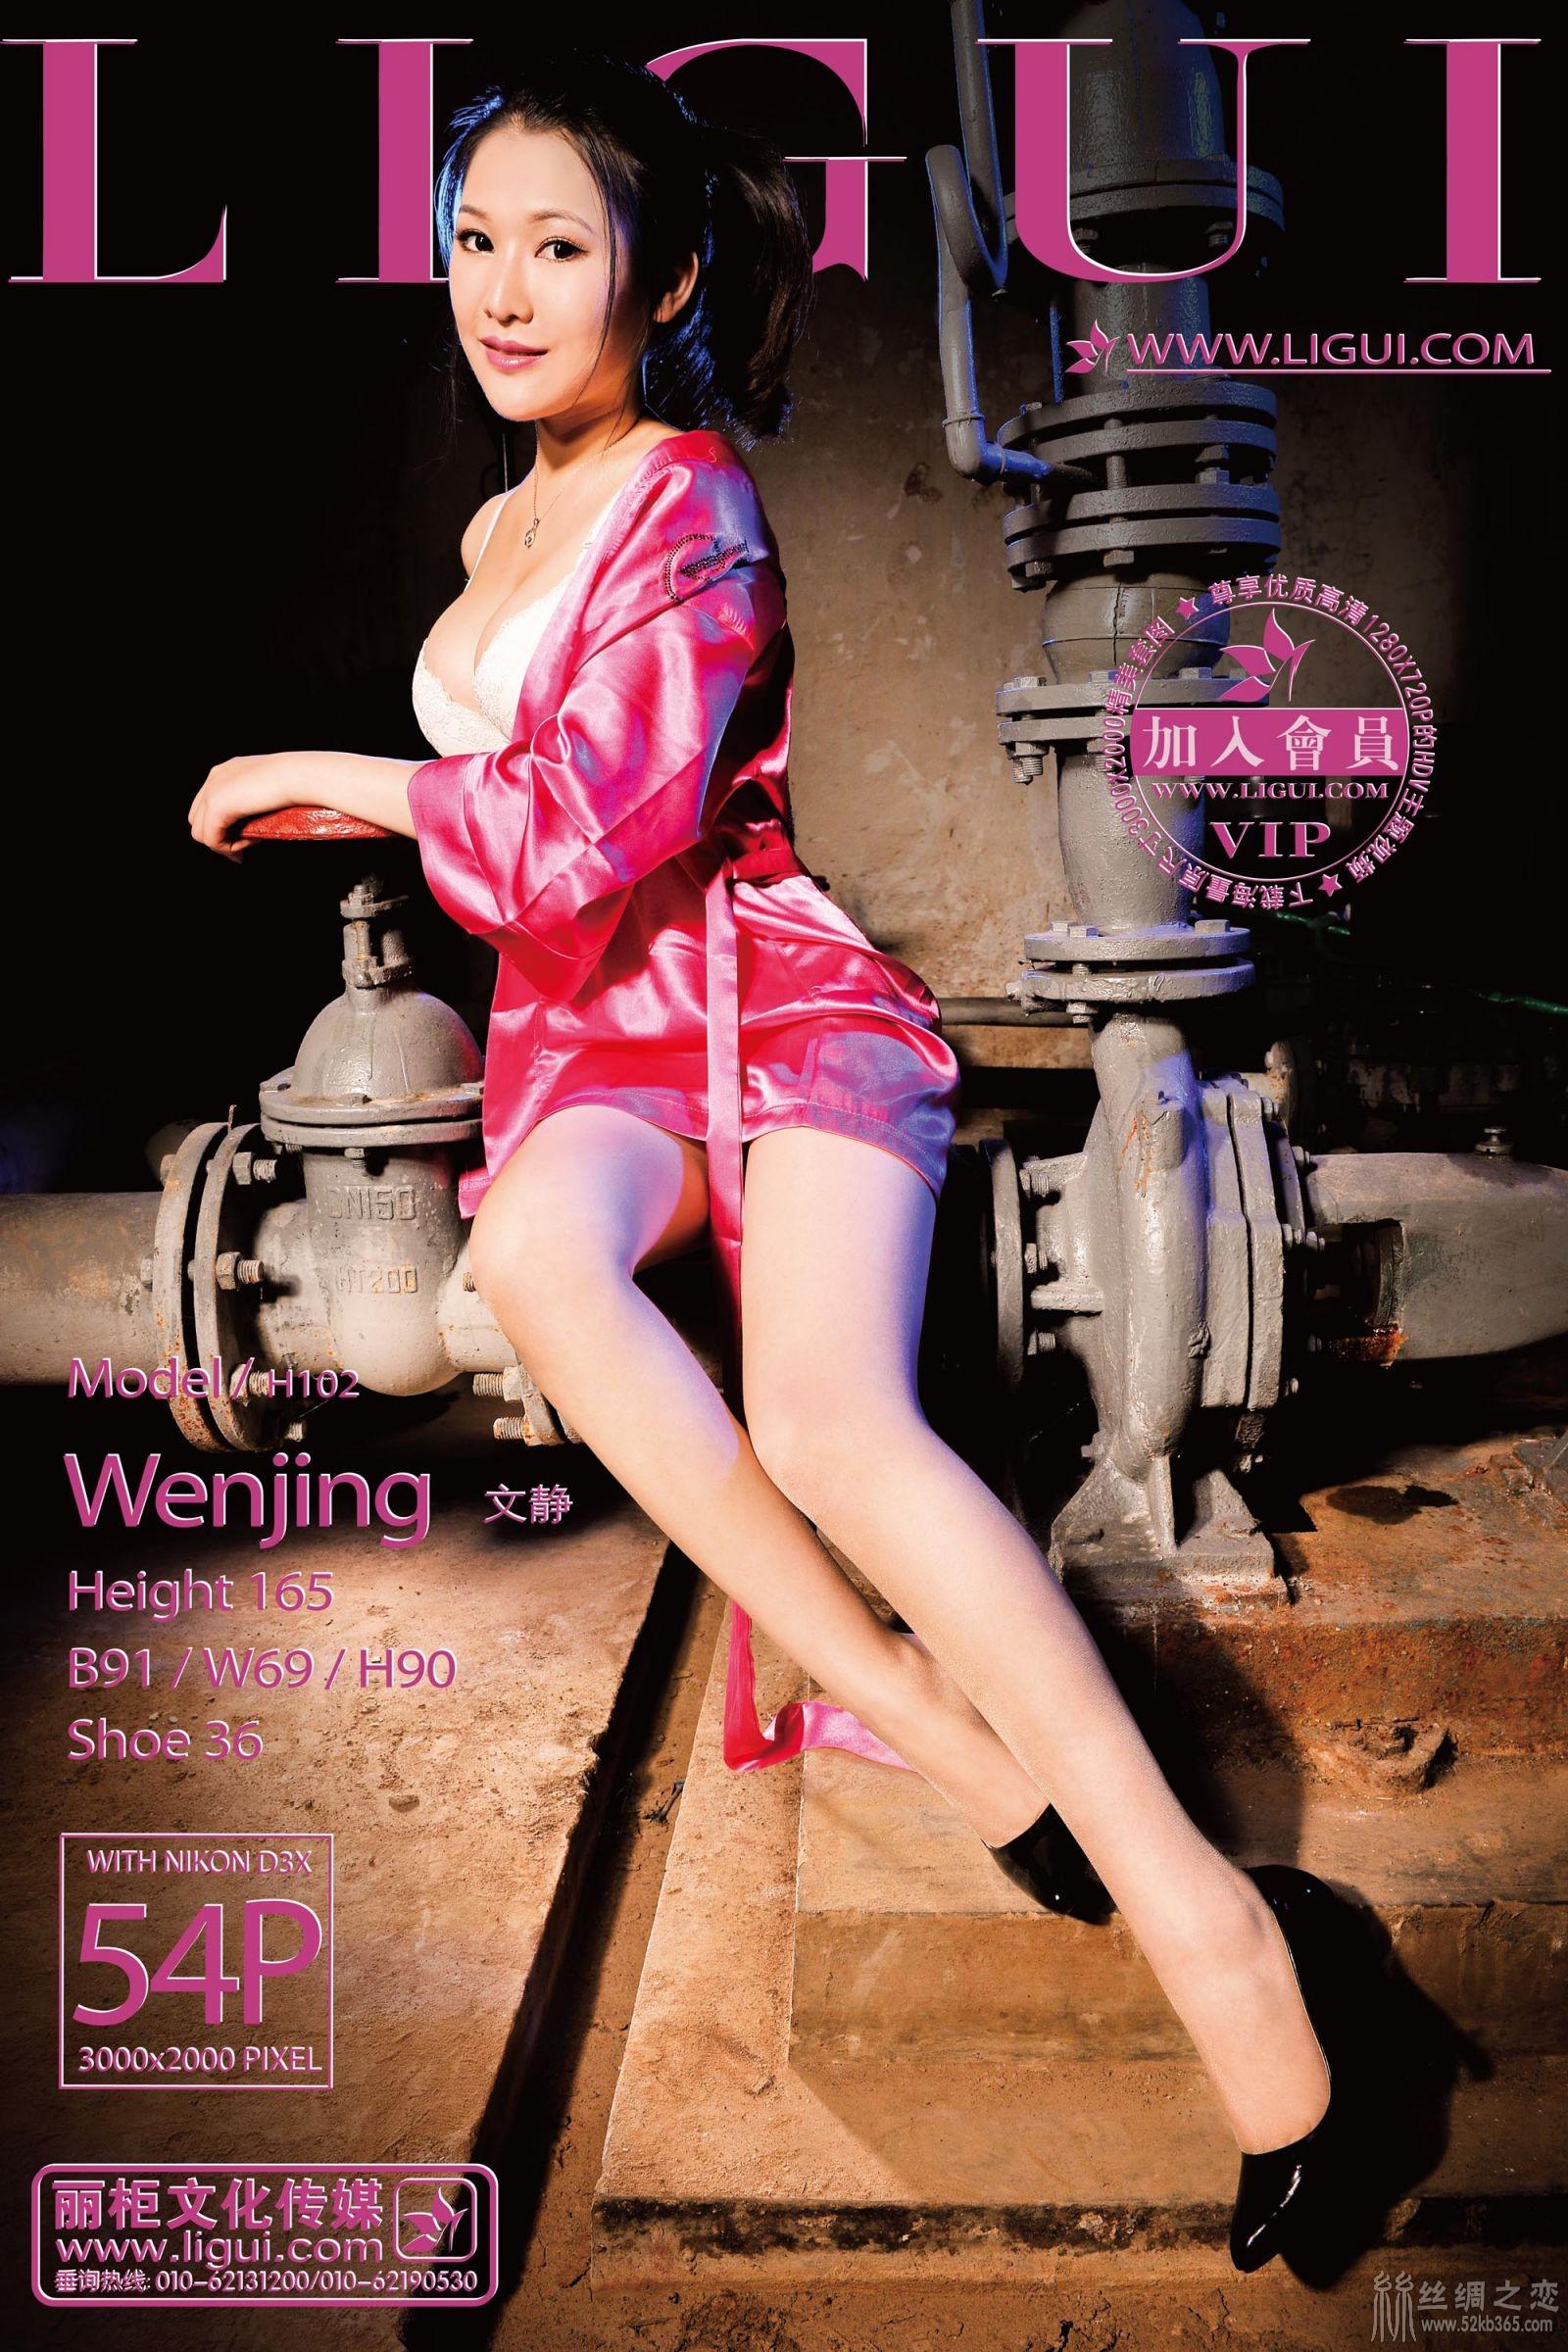 52kb [LIGUI丽柜] 文静 - 粉色丝绸睡衣+内衣+肉丝美足 套图 1  丝绸物品爱好者 213008cxogcnzfqzomgocm